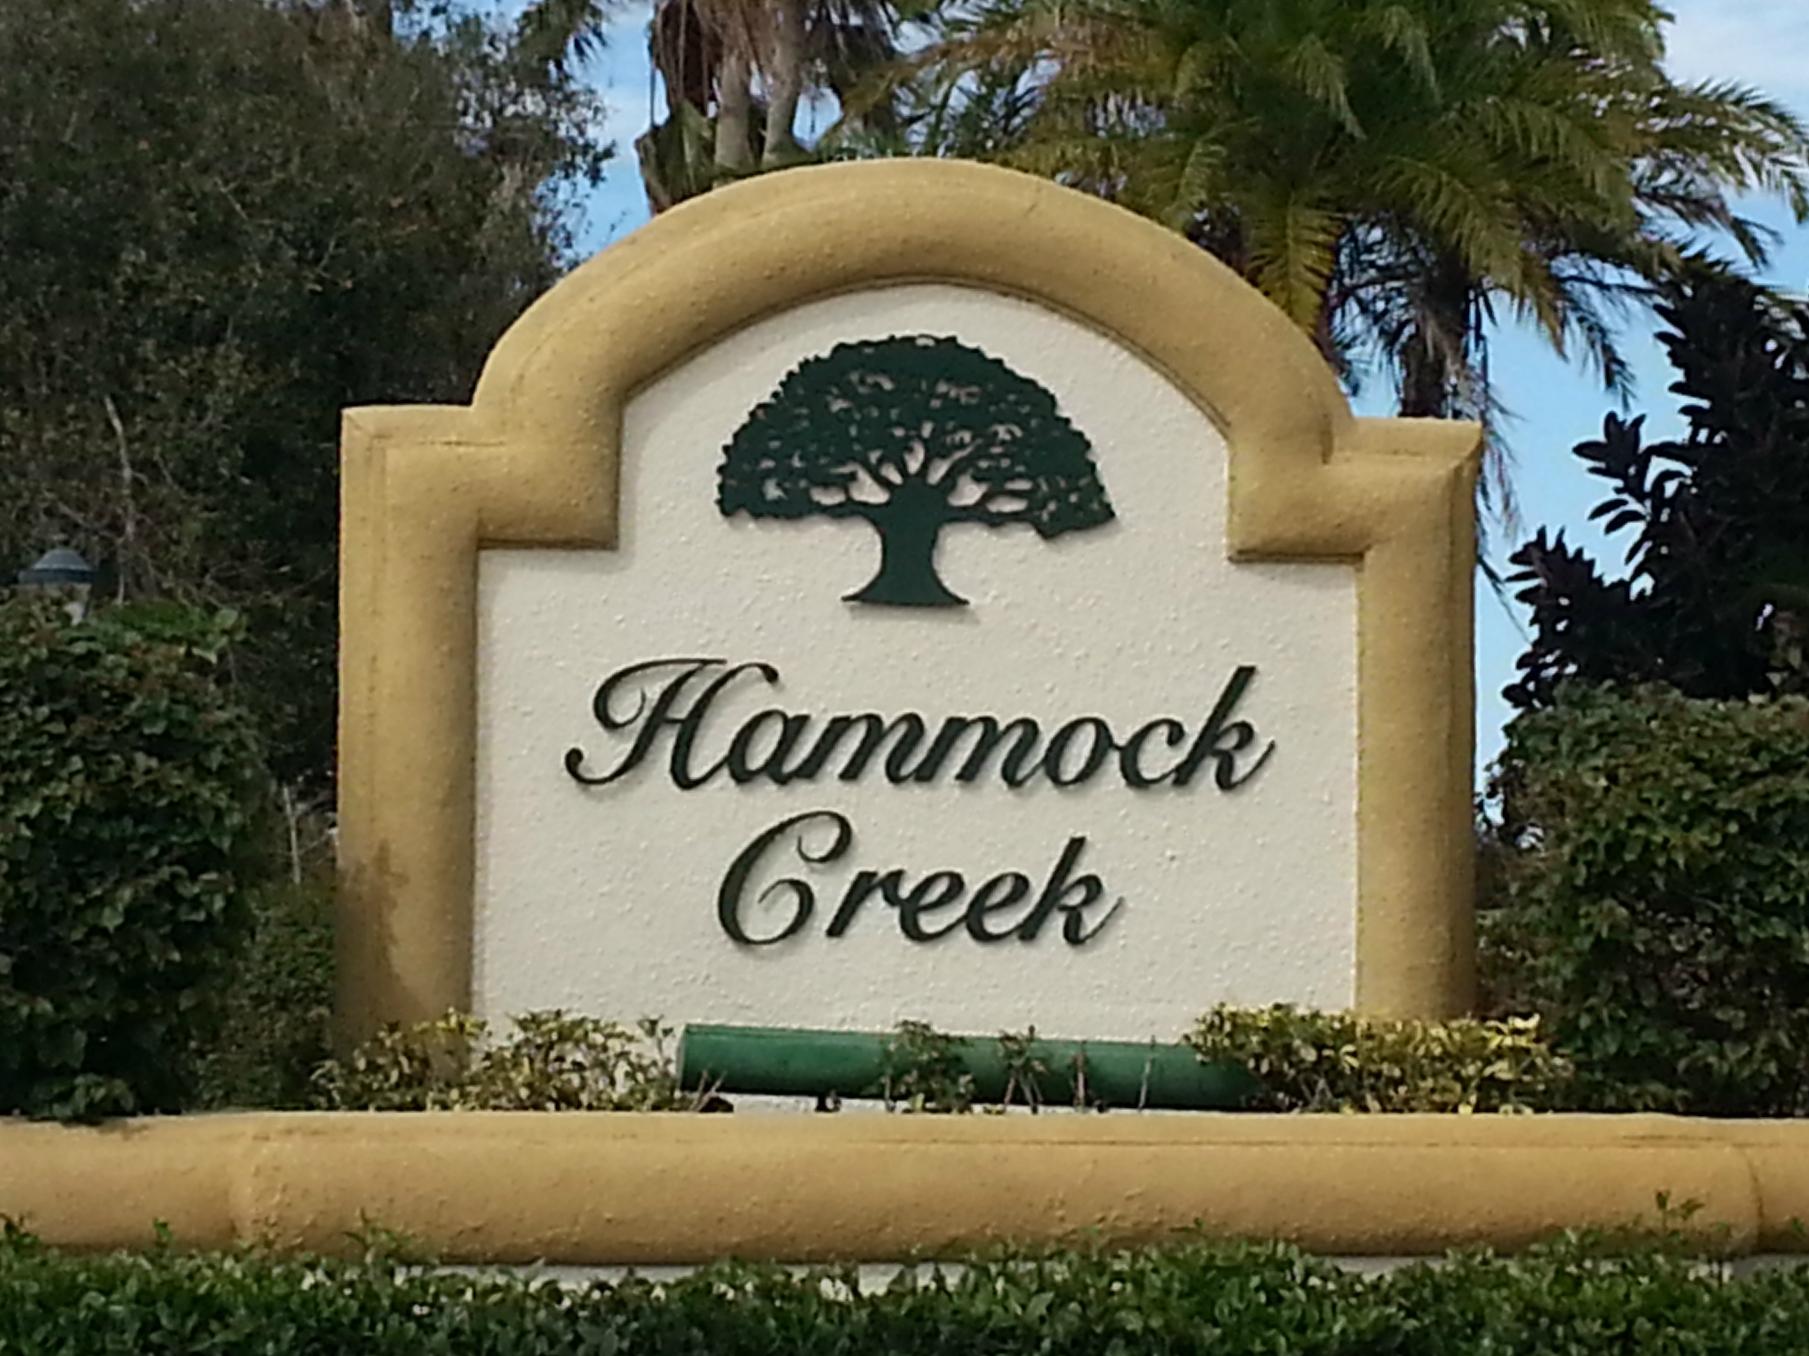 Estates of Hammock Creek sign